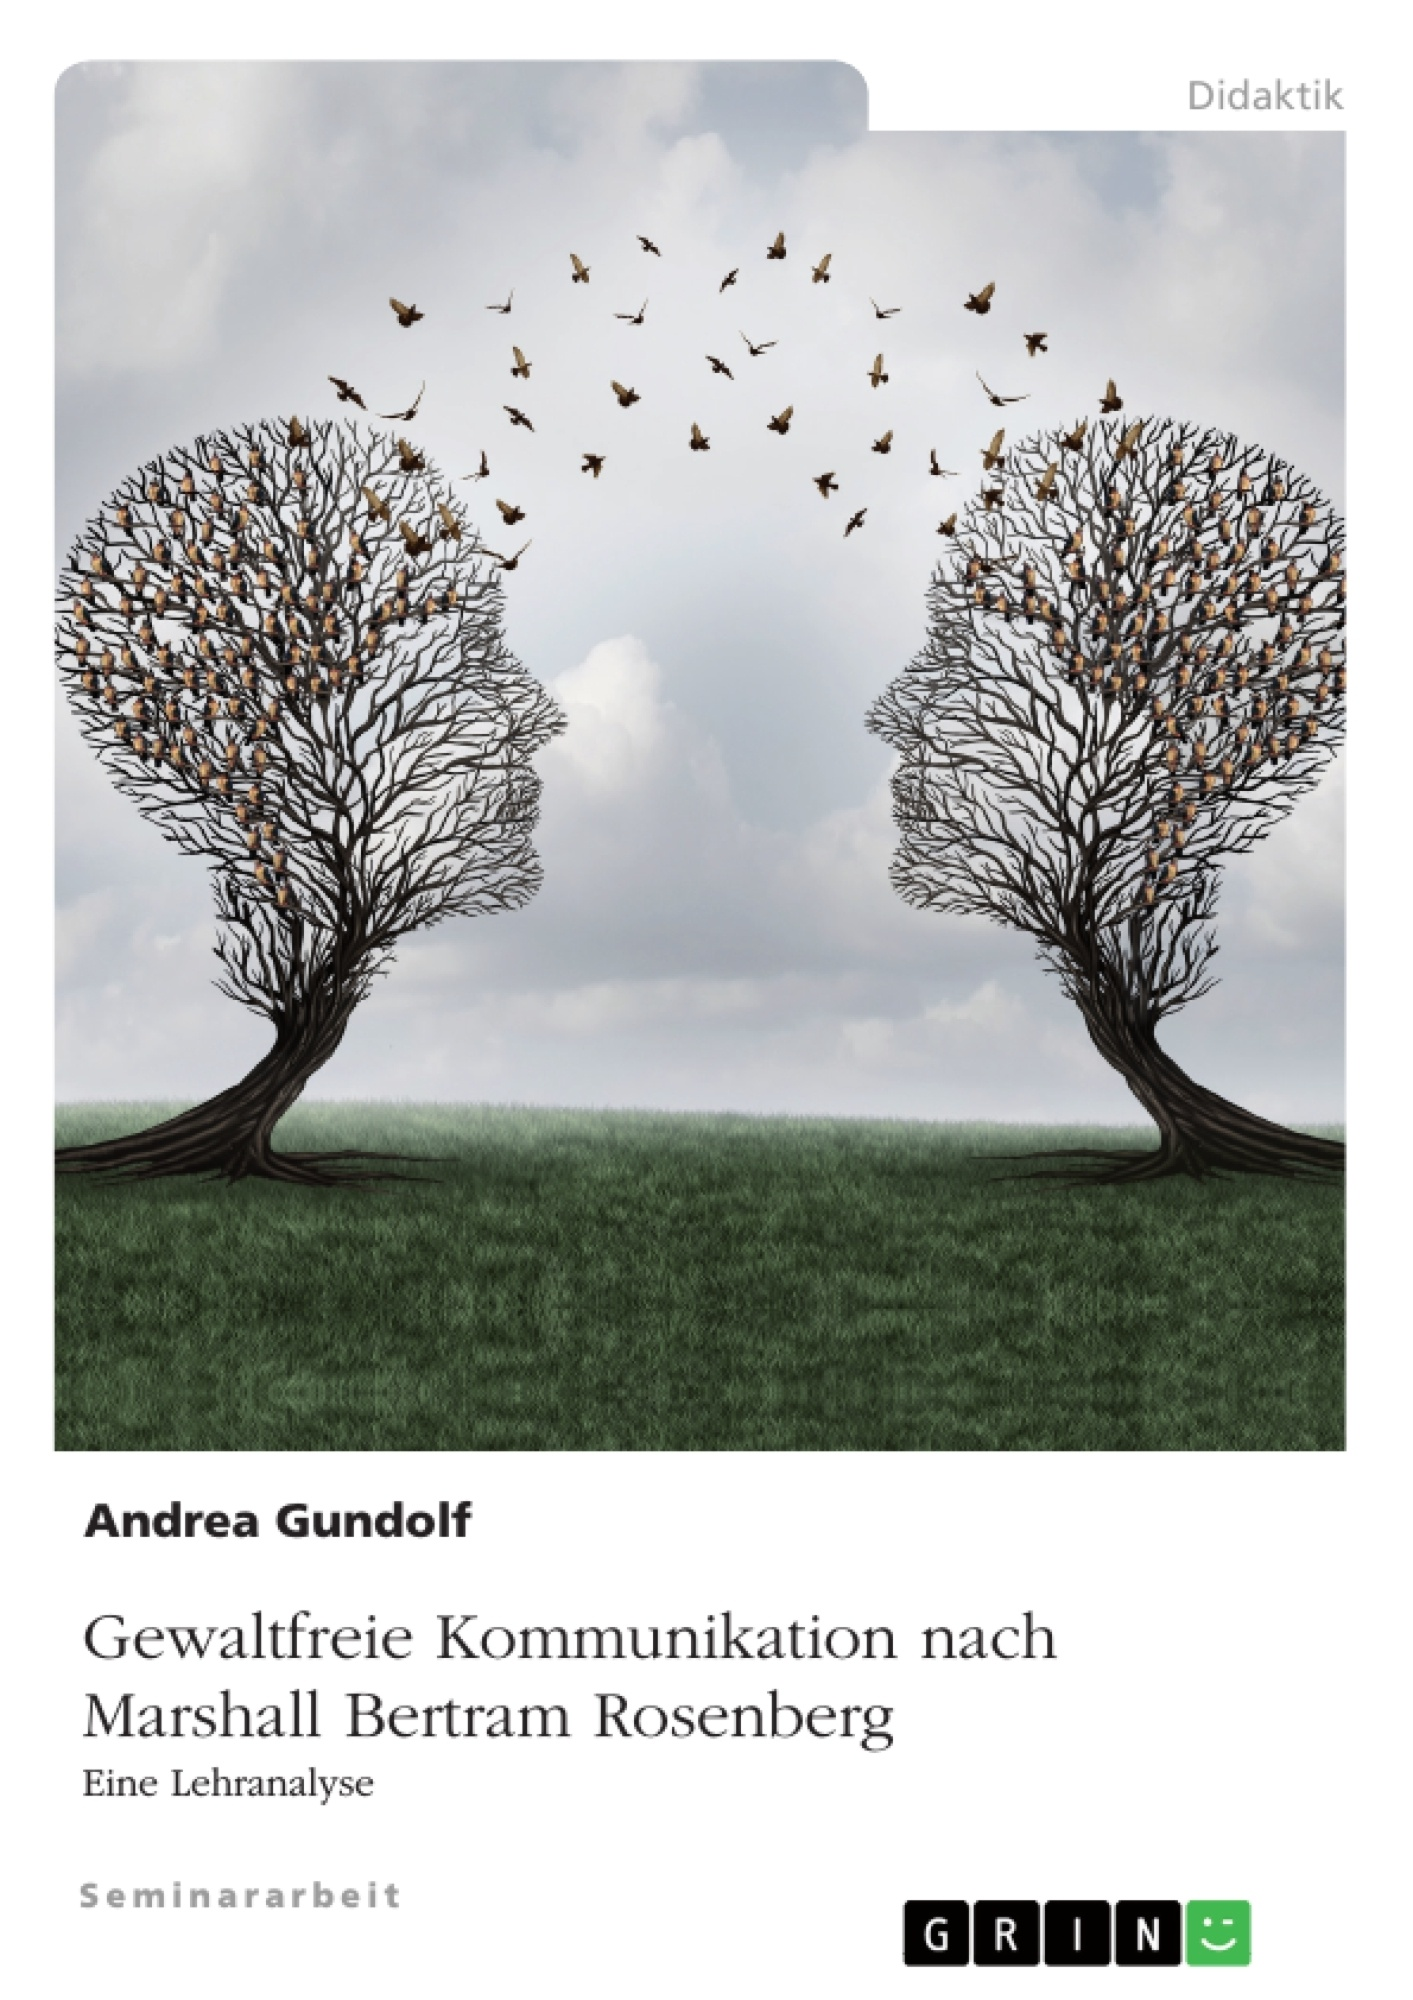 Titel: Gewaltfreie Kommunikation nach Marshall Bertram Rosenberg